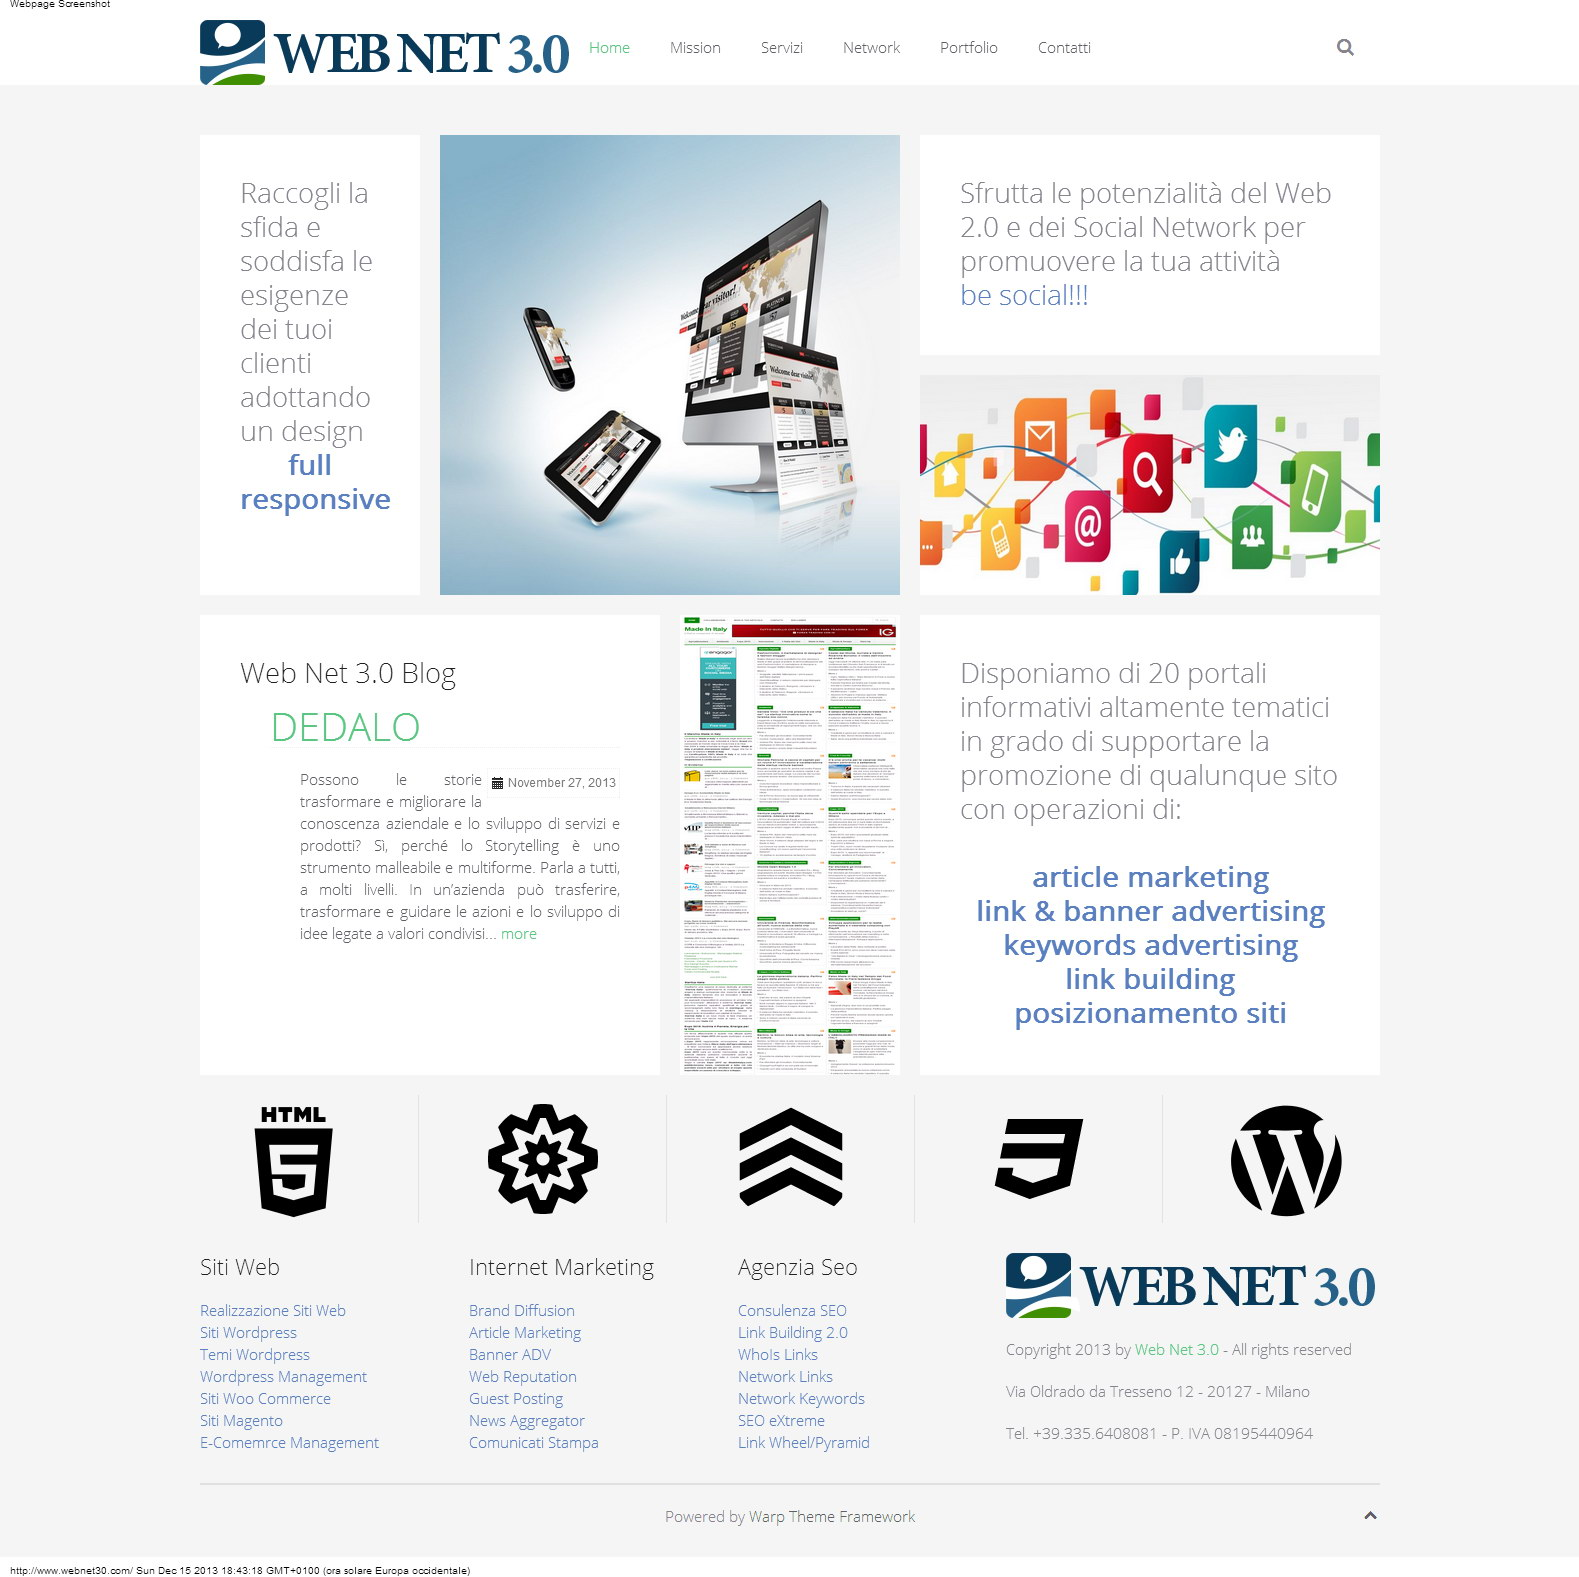 Web Net 3.0 Web Agency Agenzia Seo